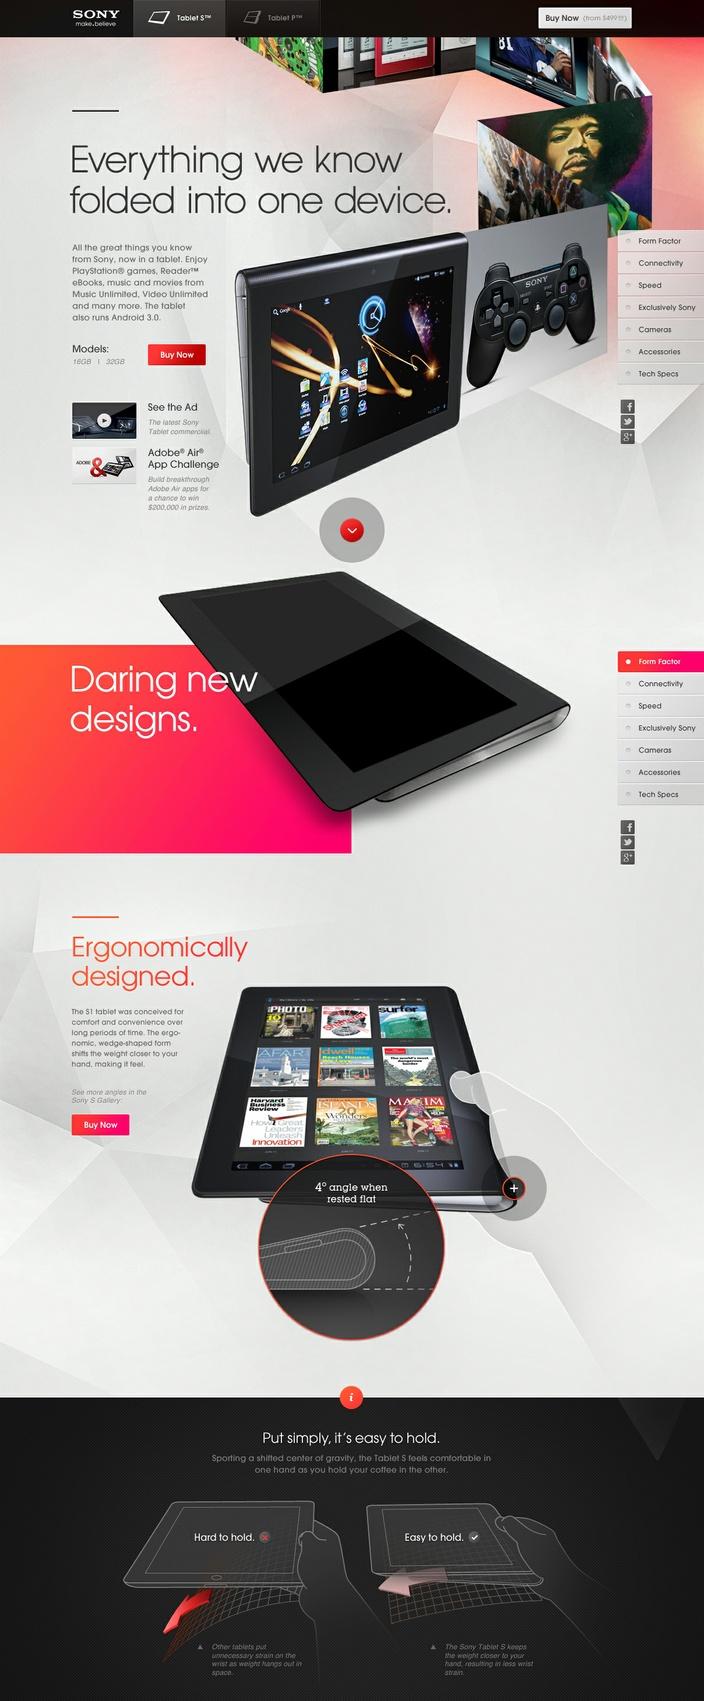 sony-tabletS-01_704x0.jpg